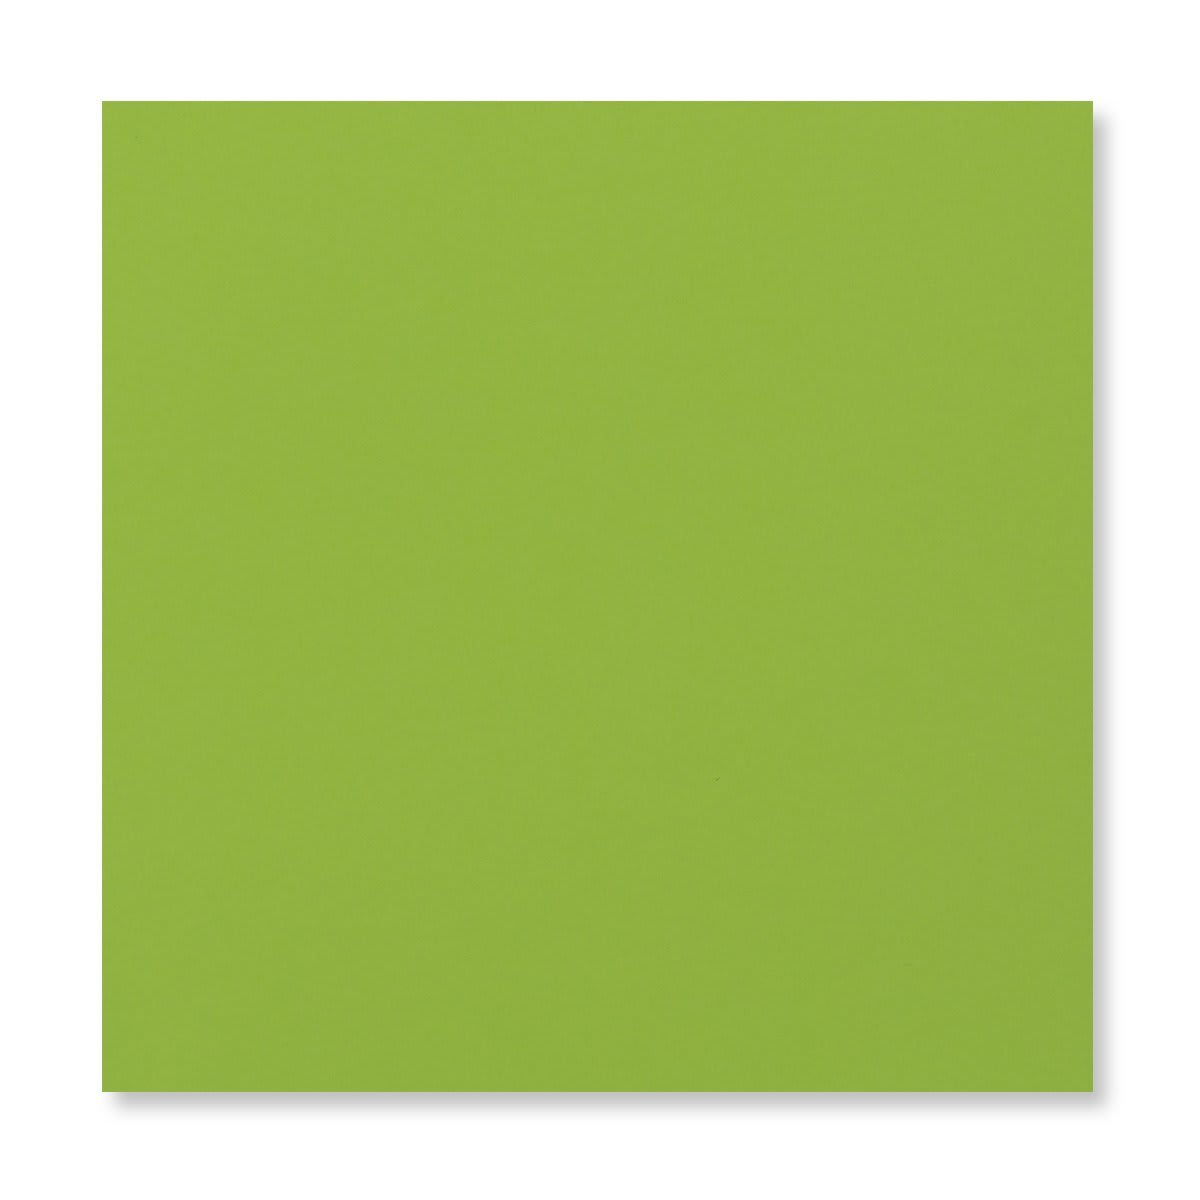 MID GREEN 155MM SQUARE PEEL & SEAL ENVELOPES